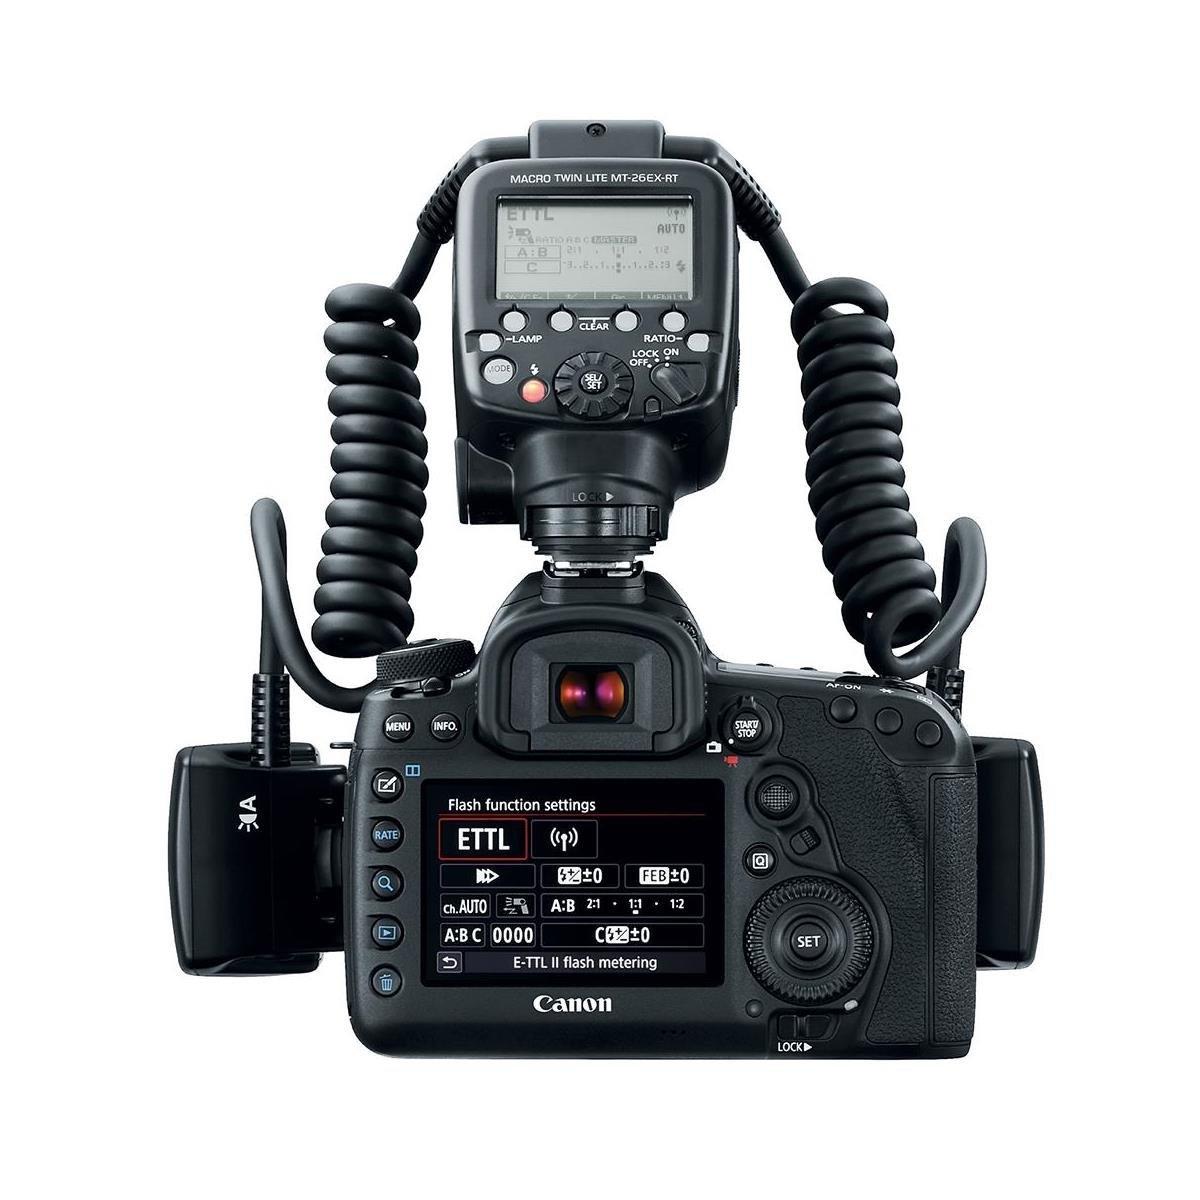 Canon MT-26EX-RT Macro Twin Lite Flash Unit USA Warranty With Accessory Bundle. by Canon (Image #4)